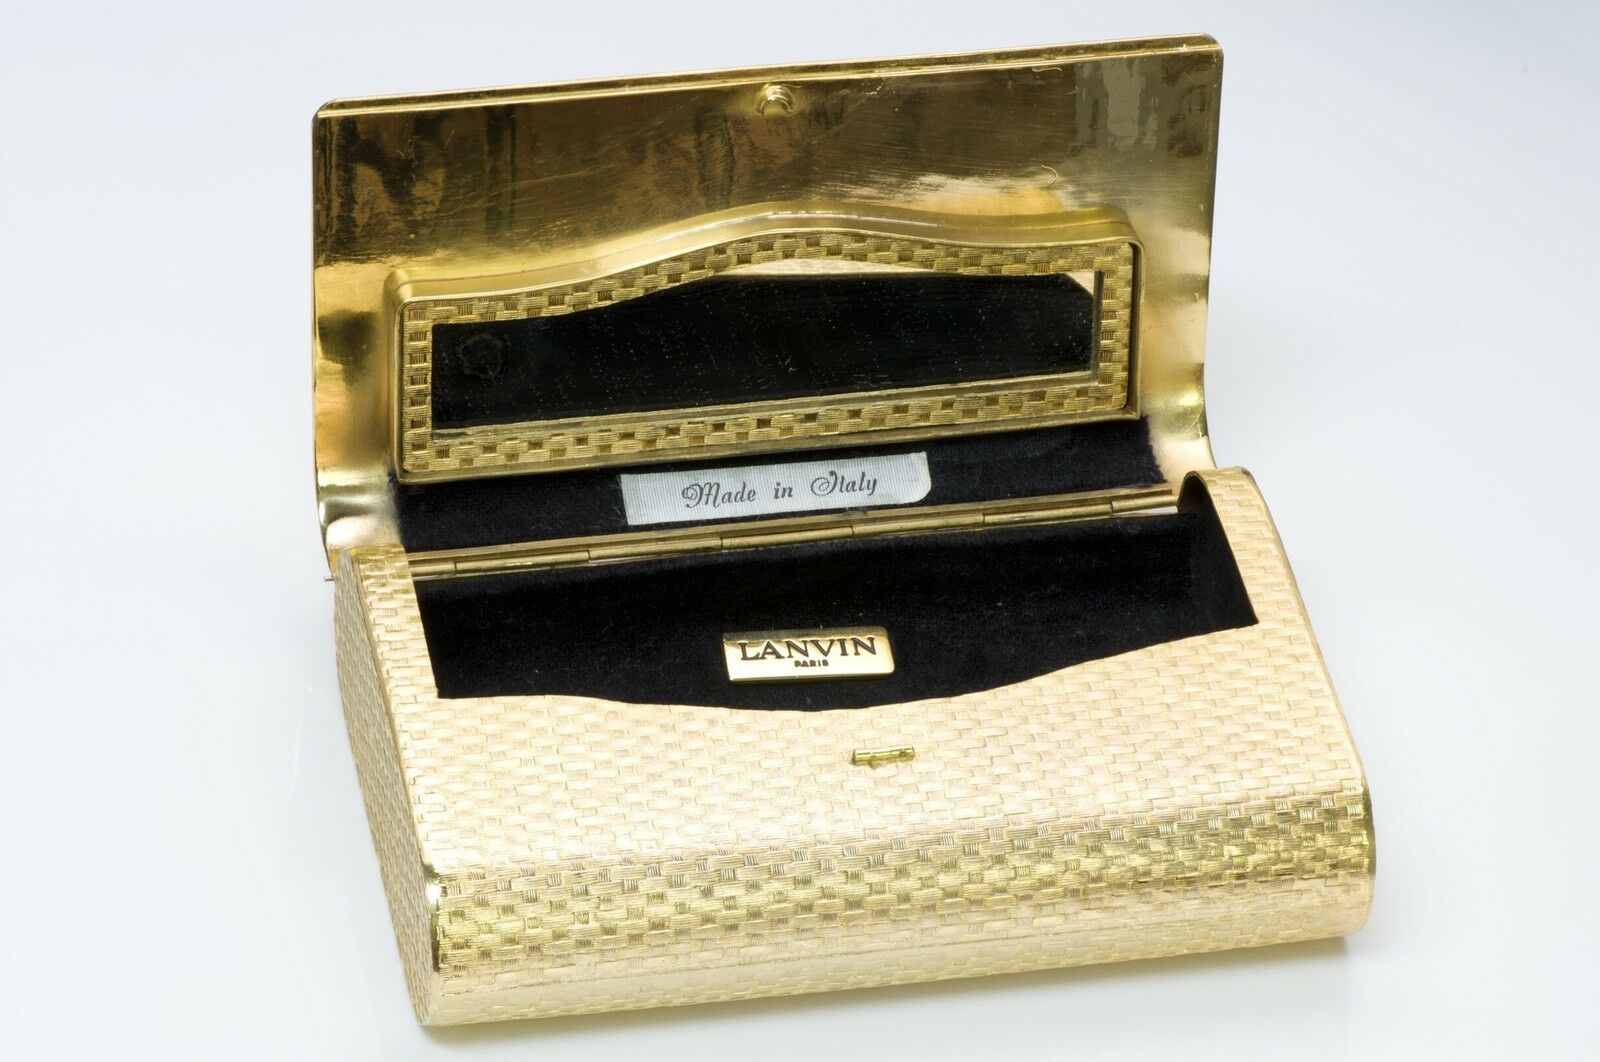 Lanvin 1970's Gold Tone Metal Clutch - image 3